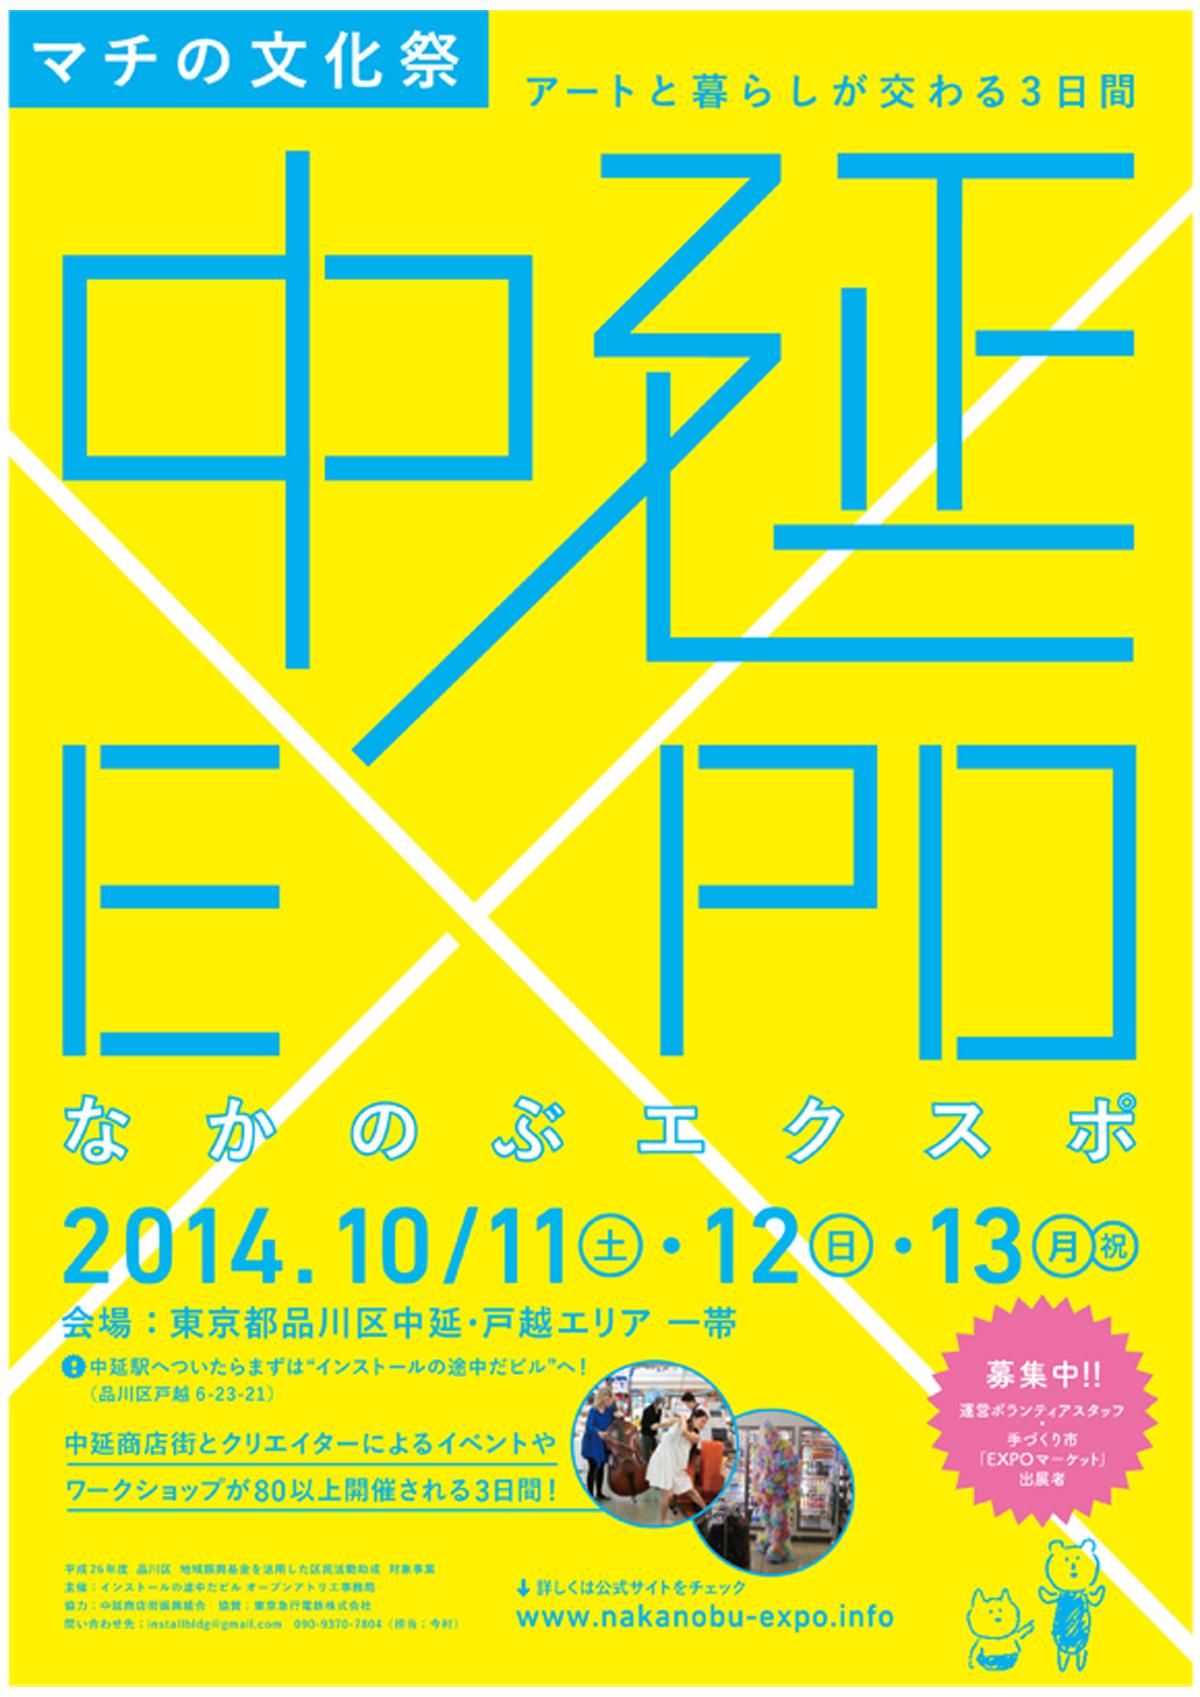 NAKANOBU-EXPO-Flyer_A